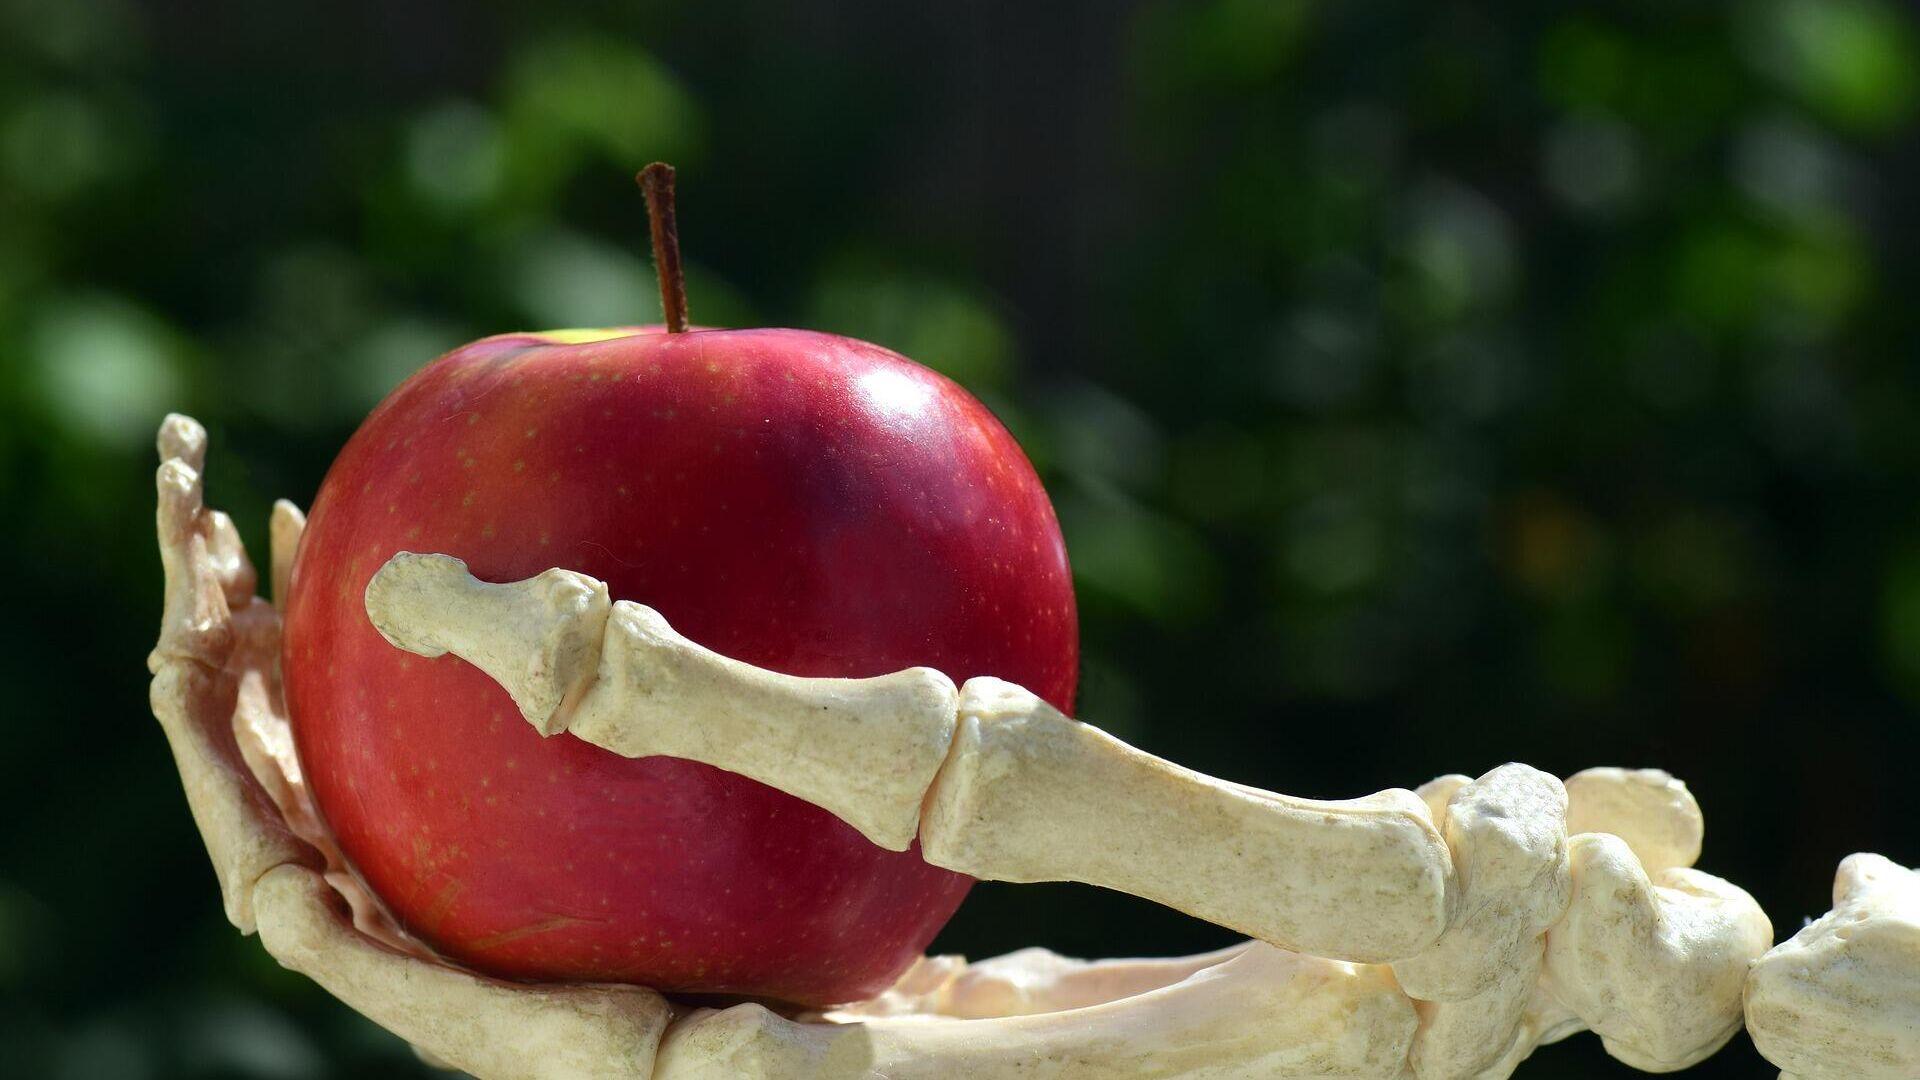 Una mano con manzana - Sputnik Mundo, 1920, 08.03.2021